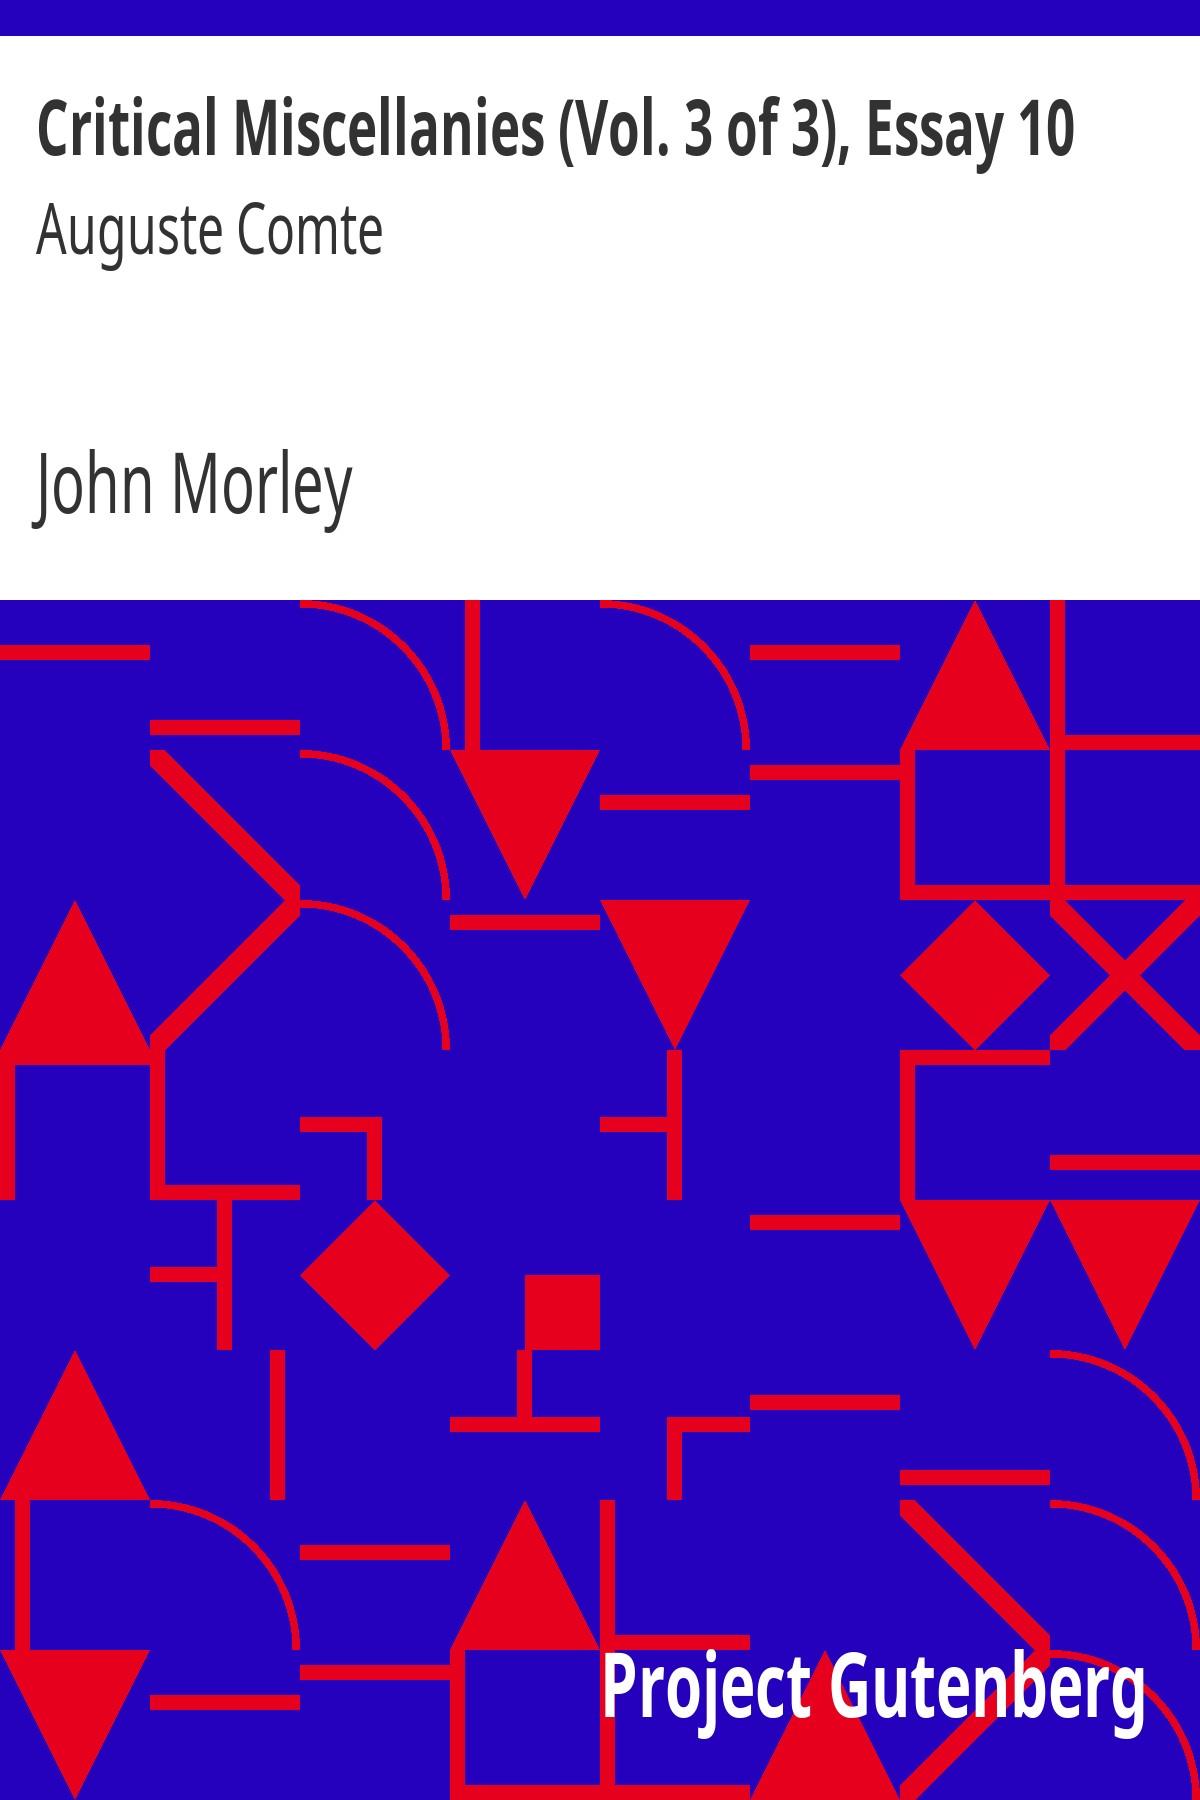 John Morley Critical Miscellanies (Vol. 3 of 3), Essay 10: Auguste Comte